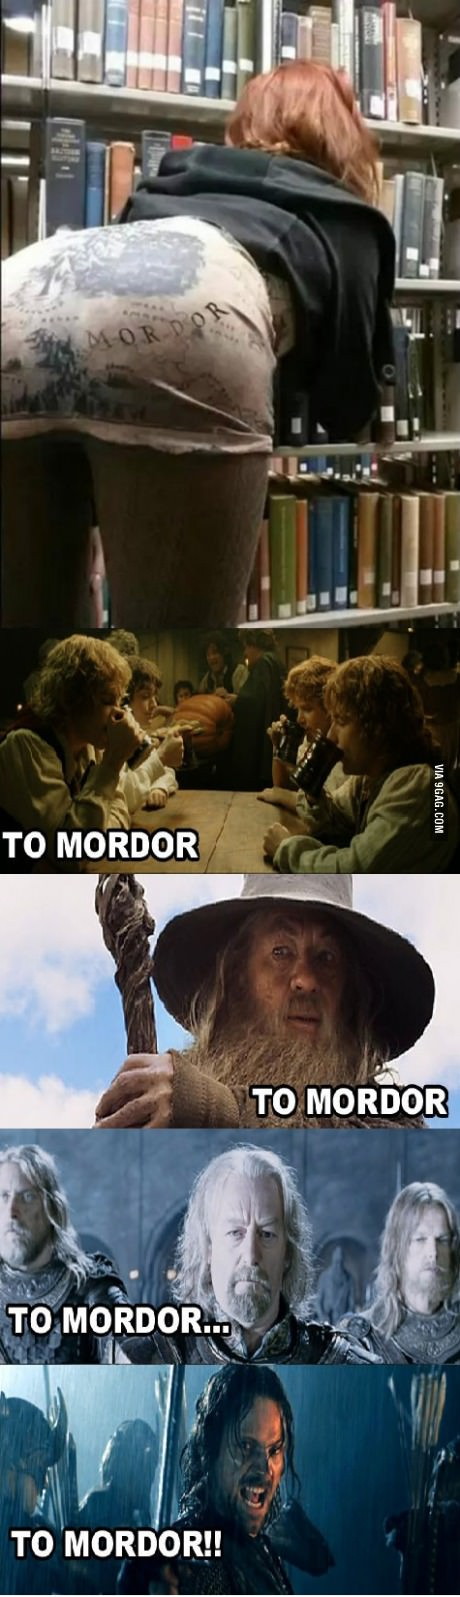 Next stop, Mordor